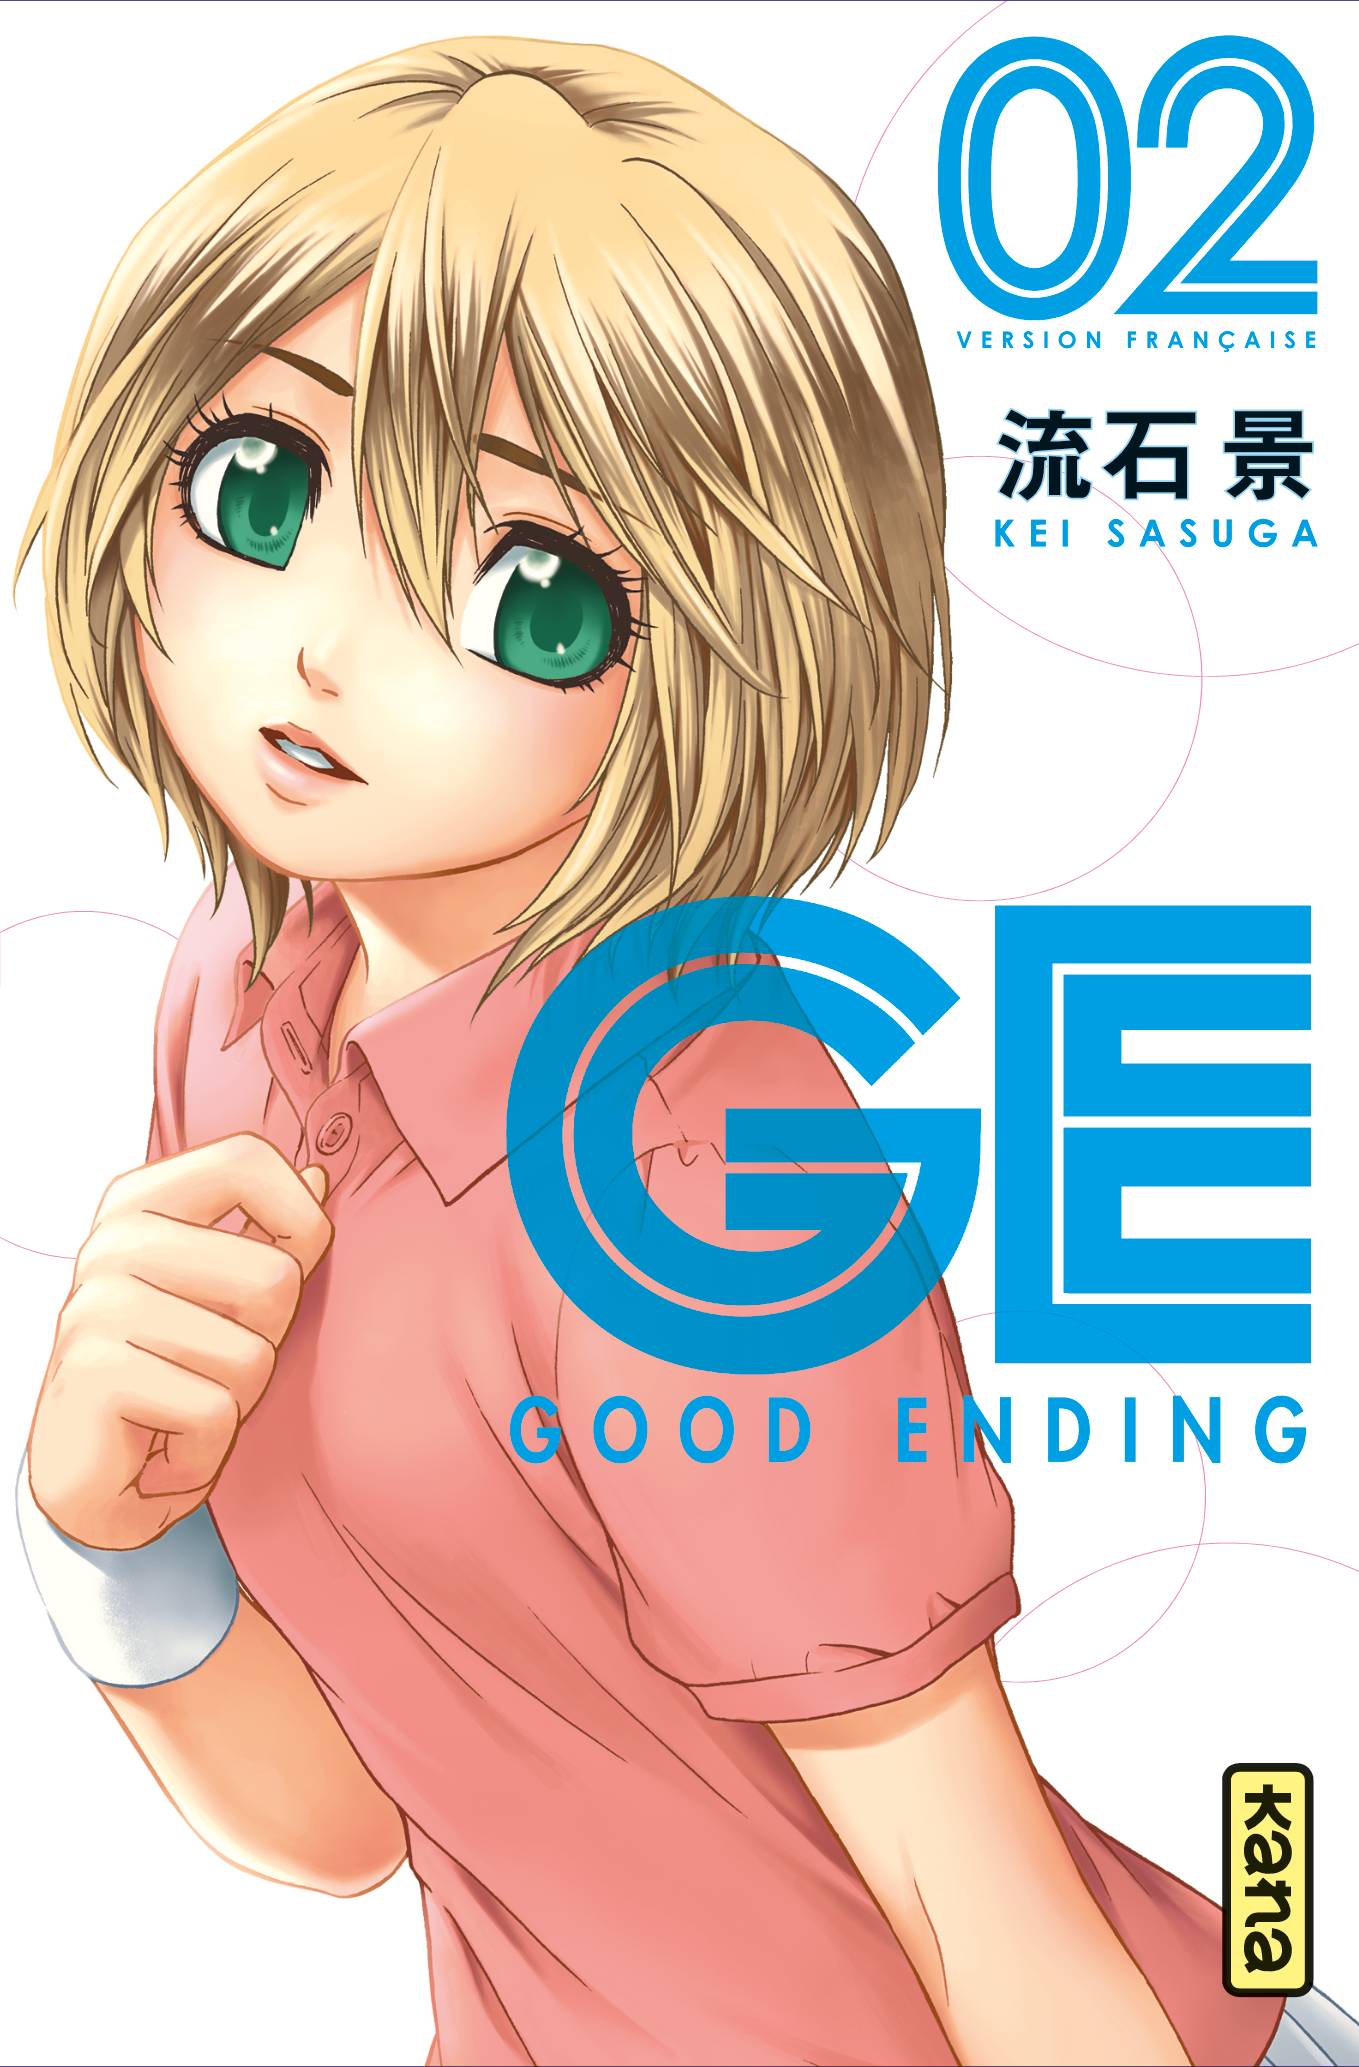 http://img.manga-sanctuary.com/big/ge-good-ending-manga-volume-2-simple-56045.jpg